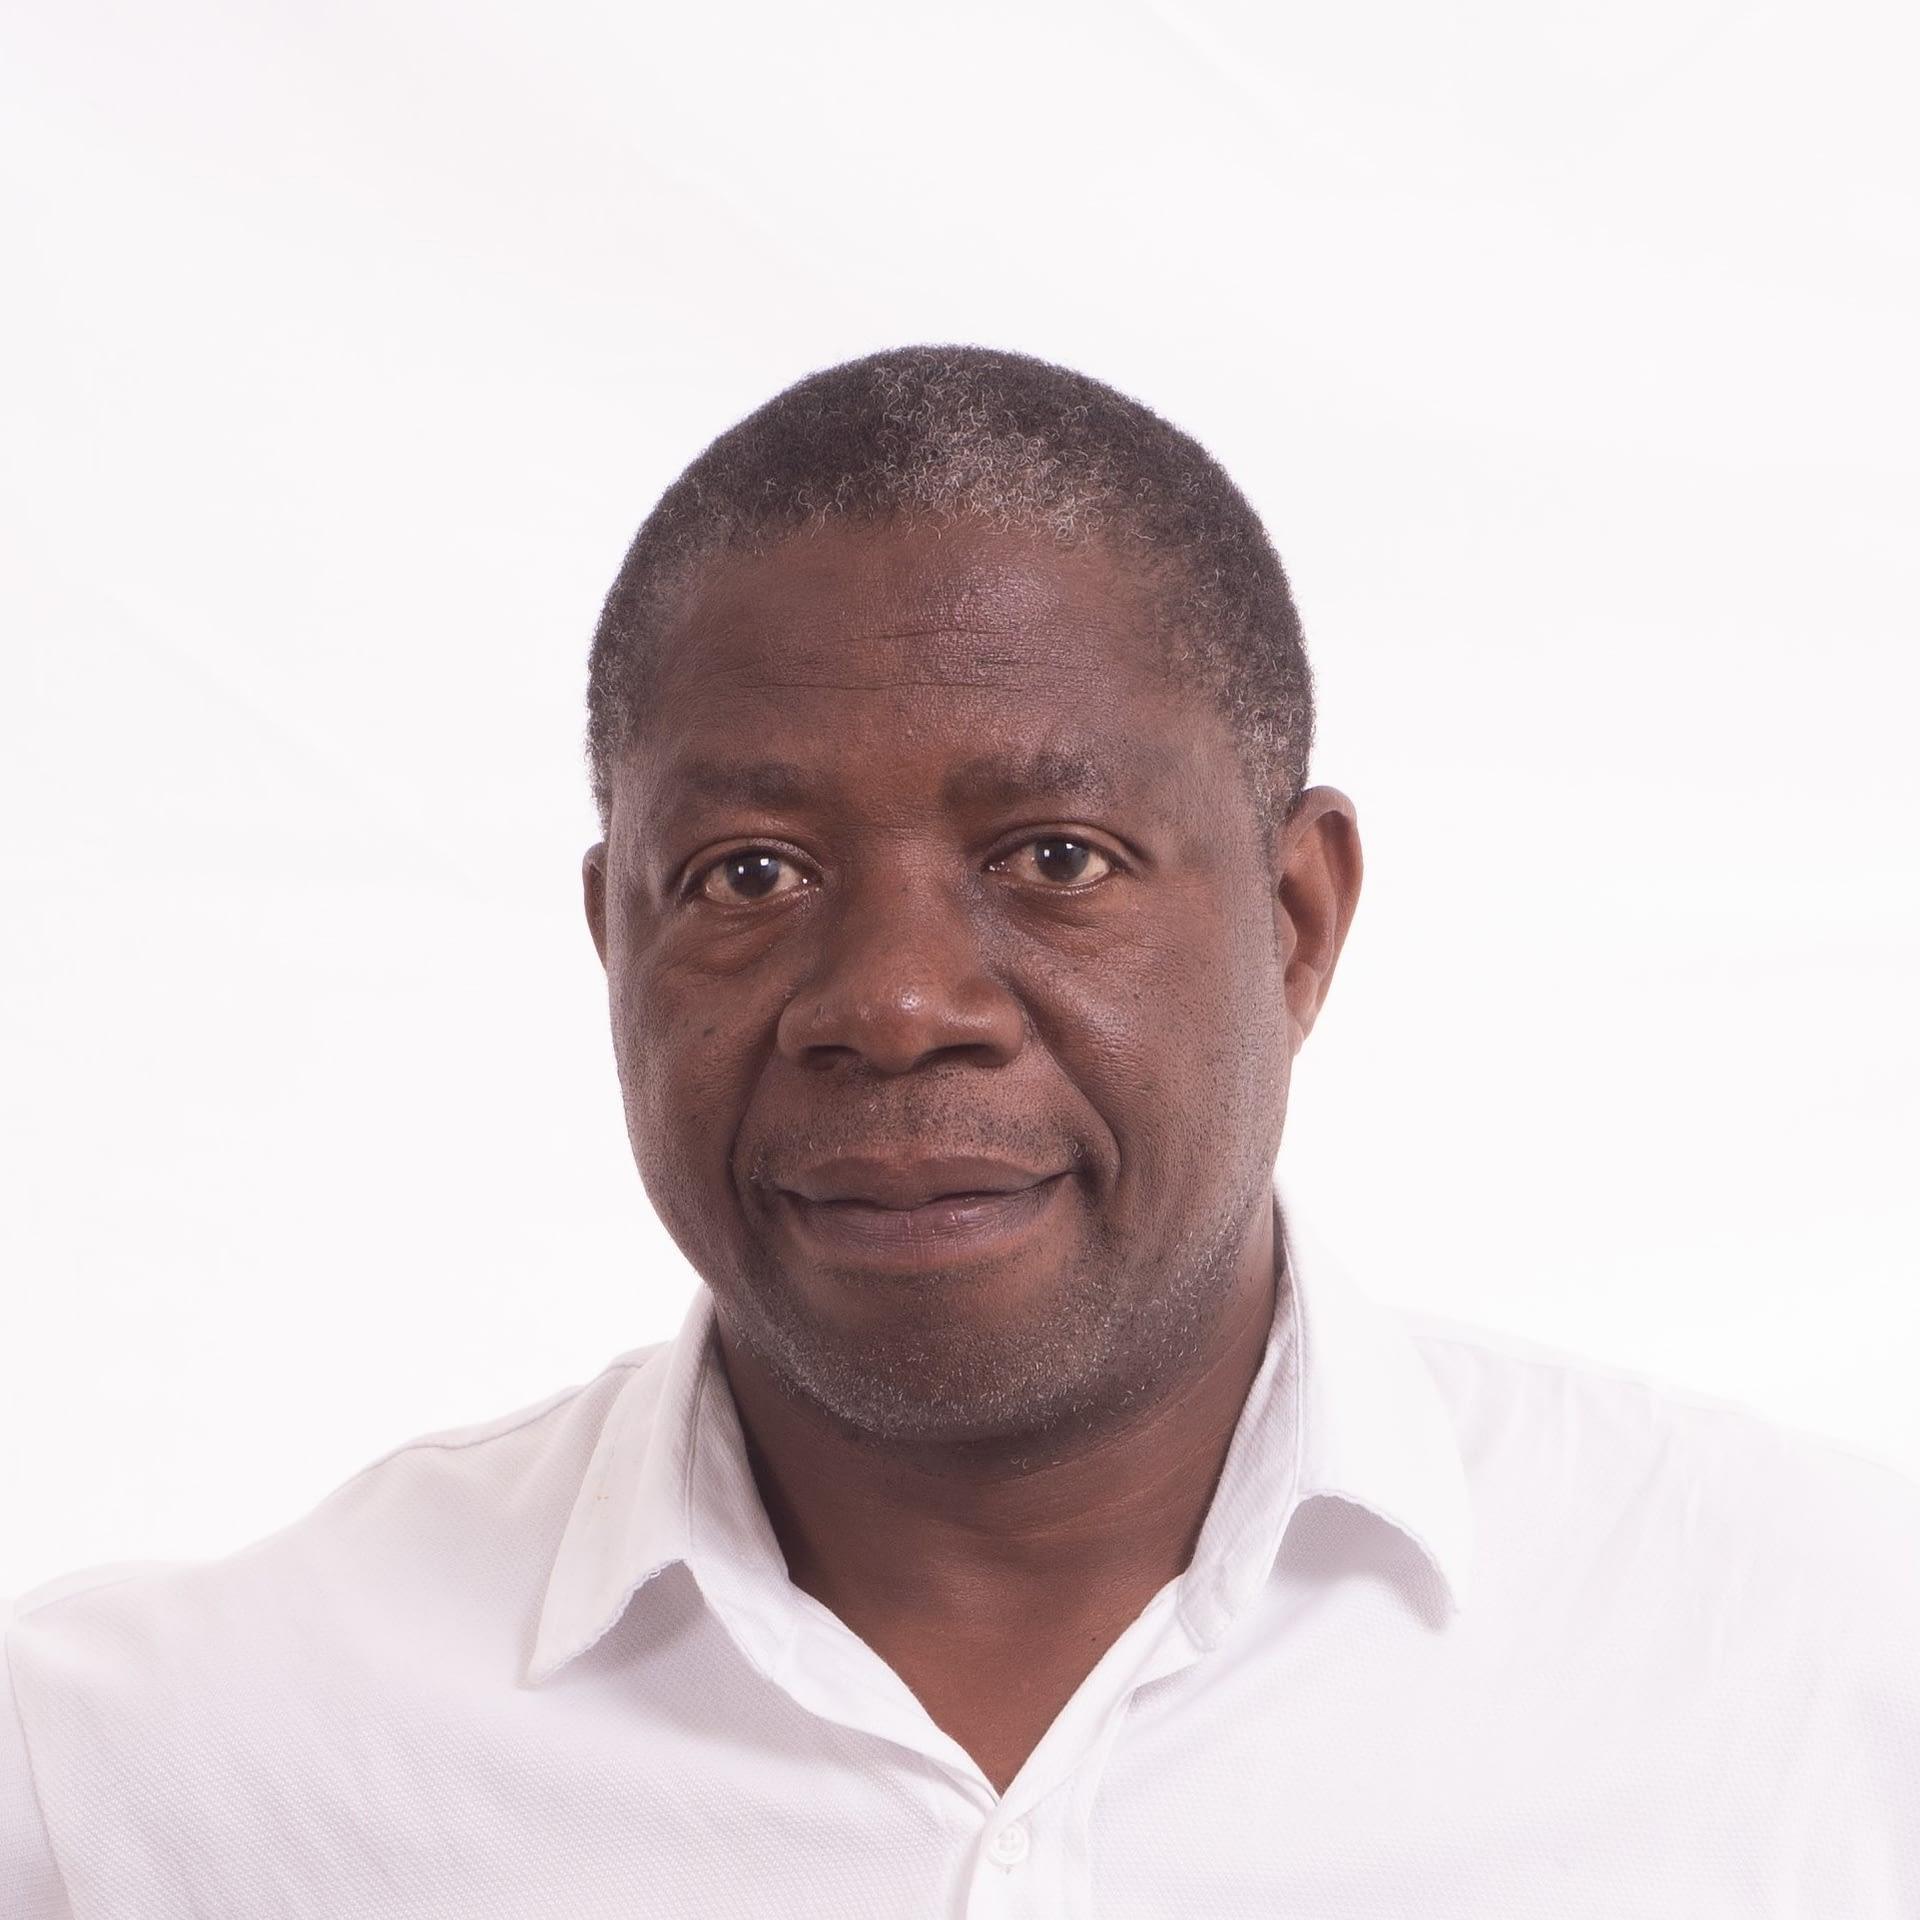 Profile image for Isaiah Nyagumbo